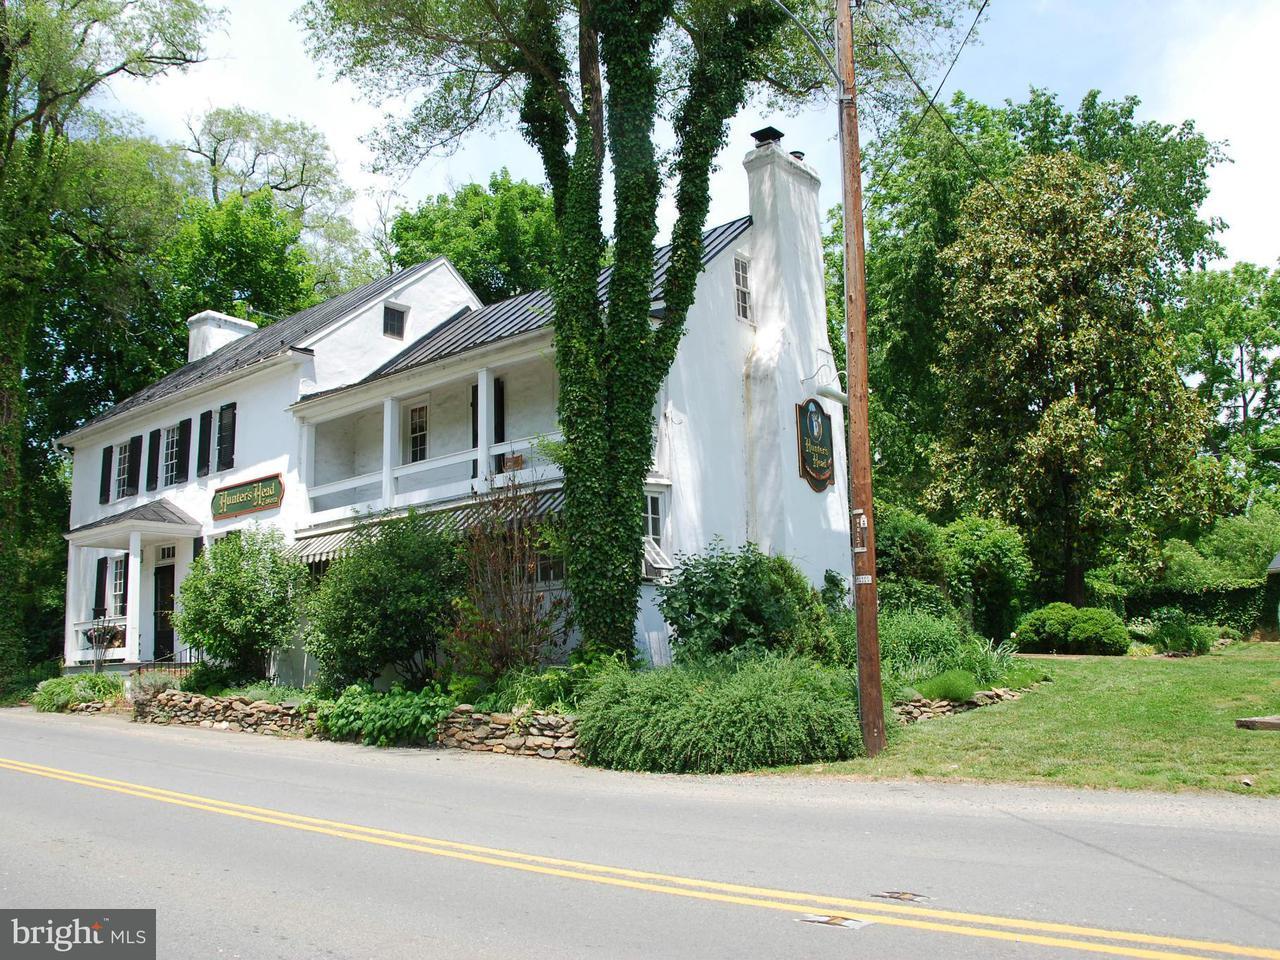 Additional photo for property listing at 6241 JOHN MOSBY HWY 6241 JOHN MOSBY HWY Middleburg, 버지니아 20117 미국